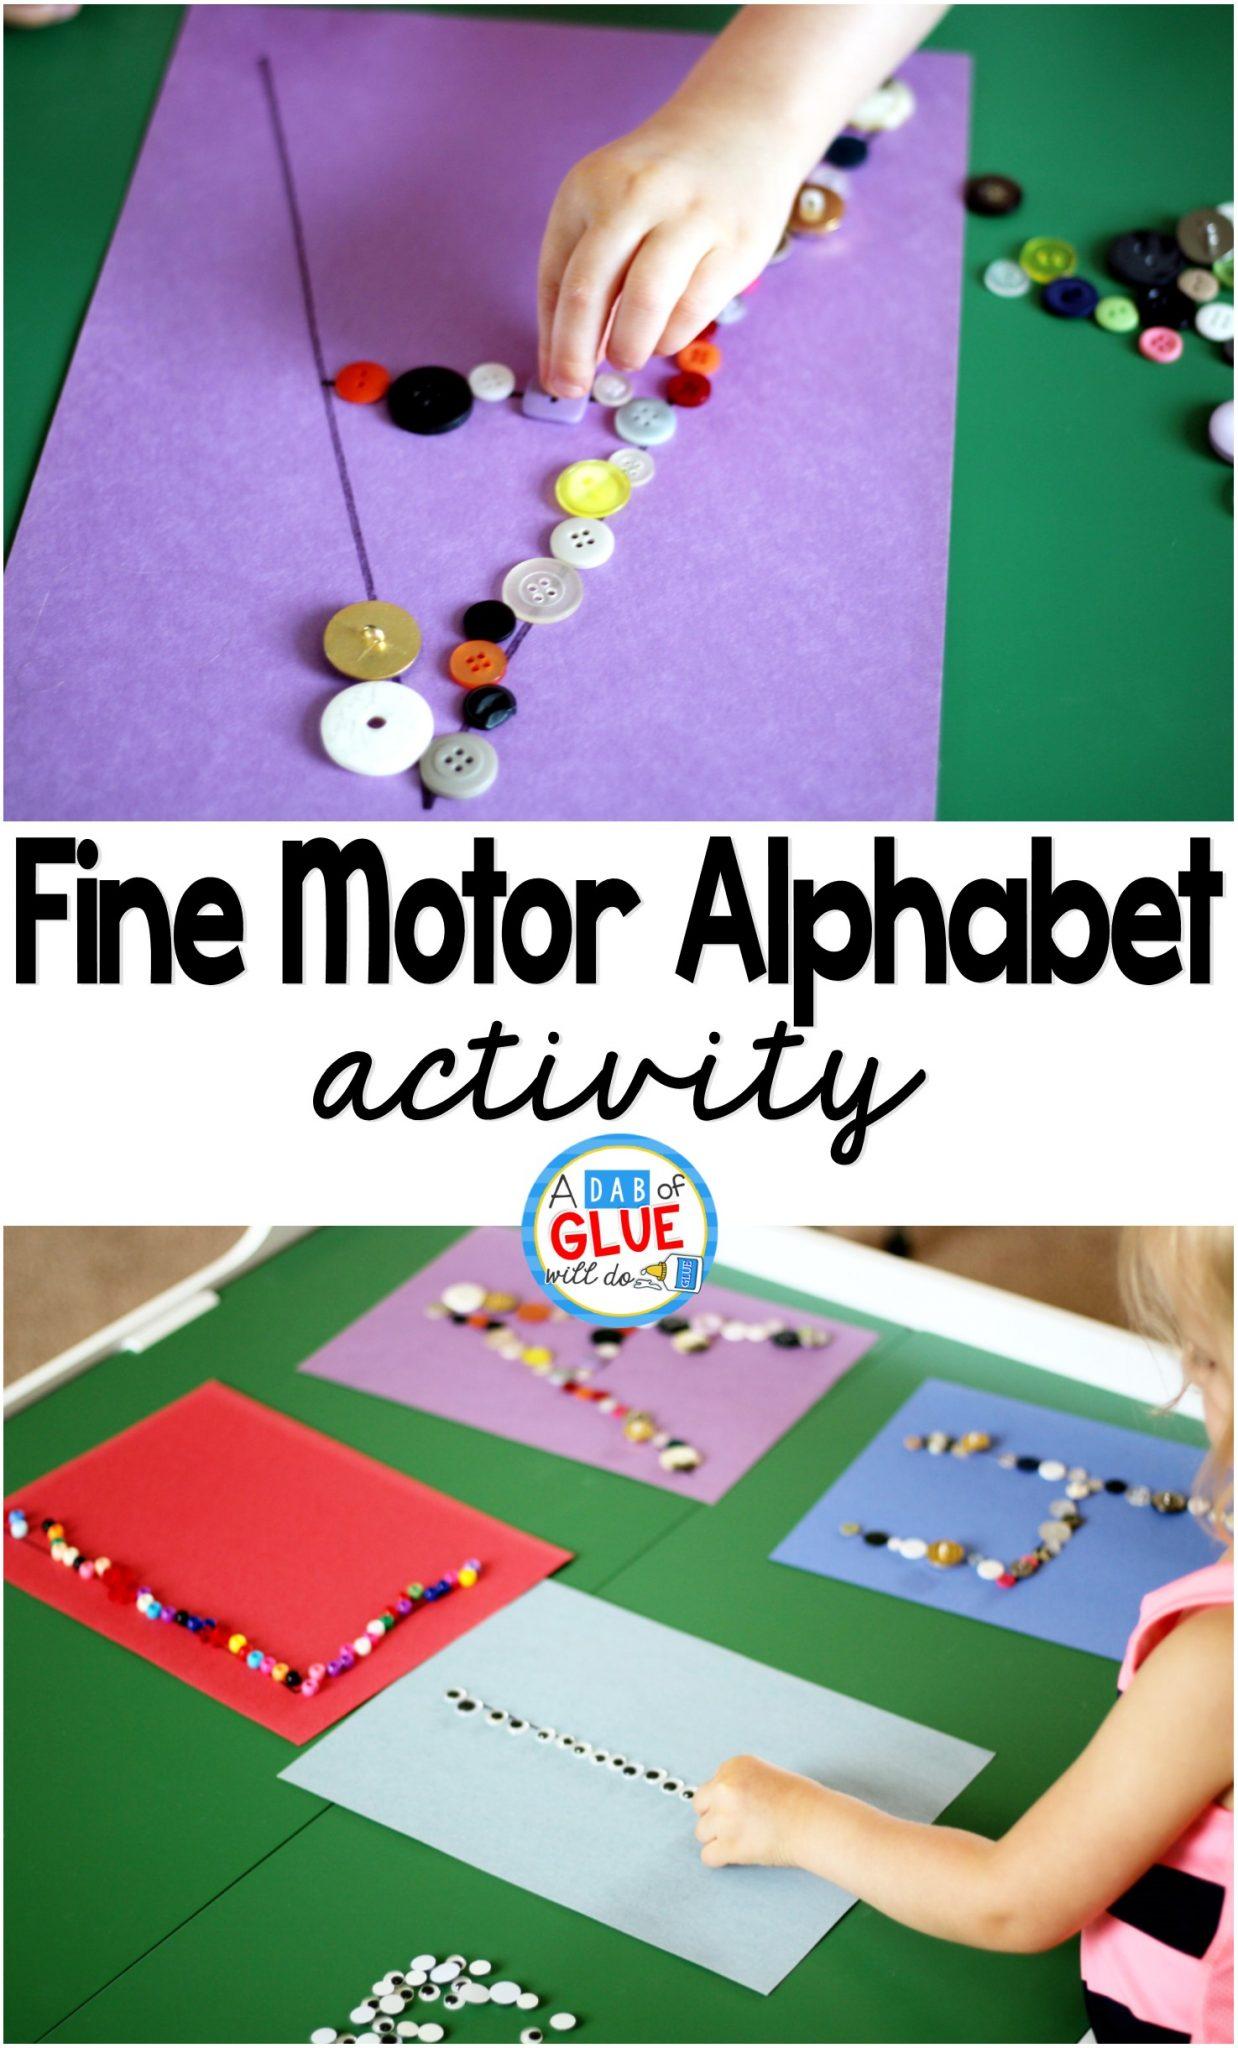 Fine Motor Skills Alphabet Activity A Dab Of Glue Will Do